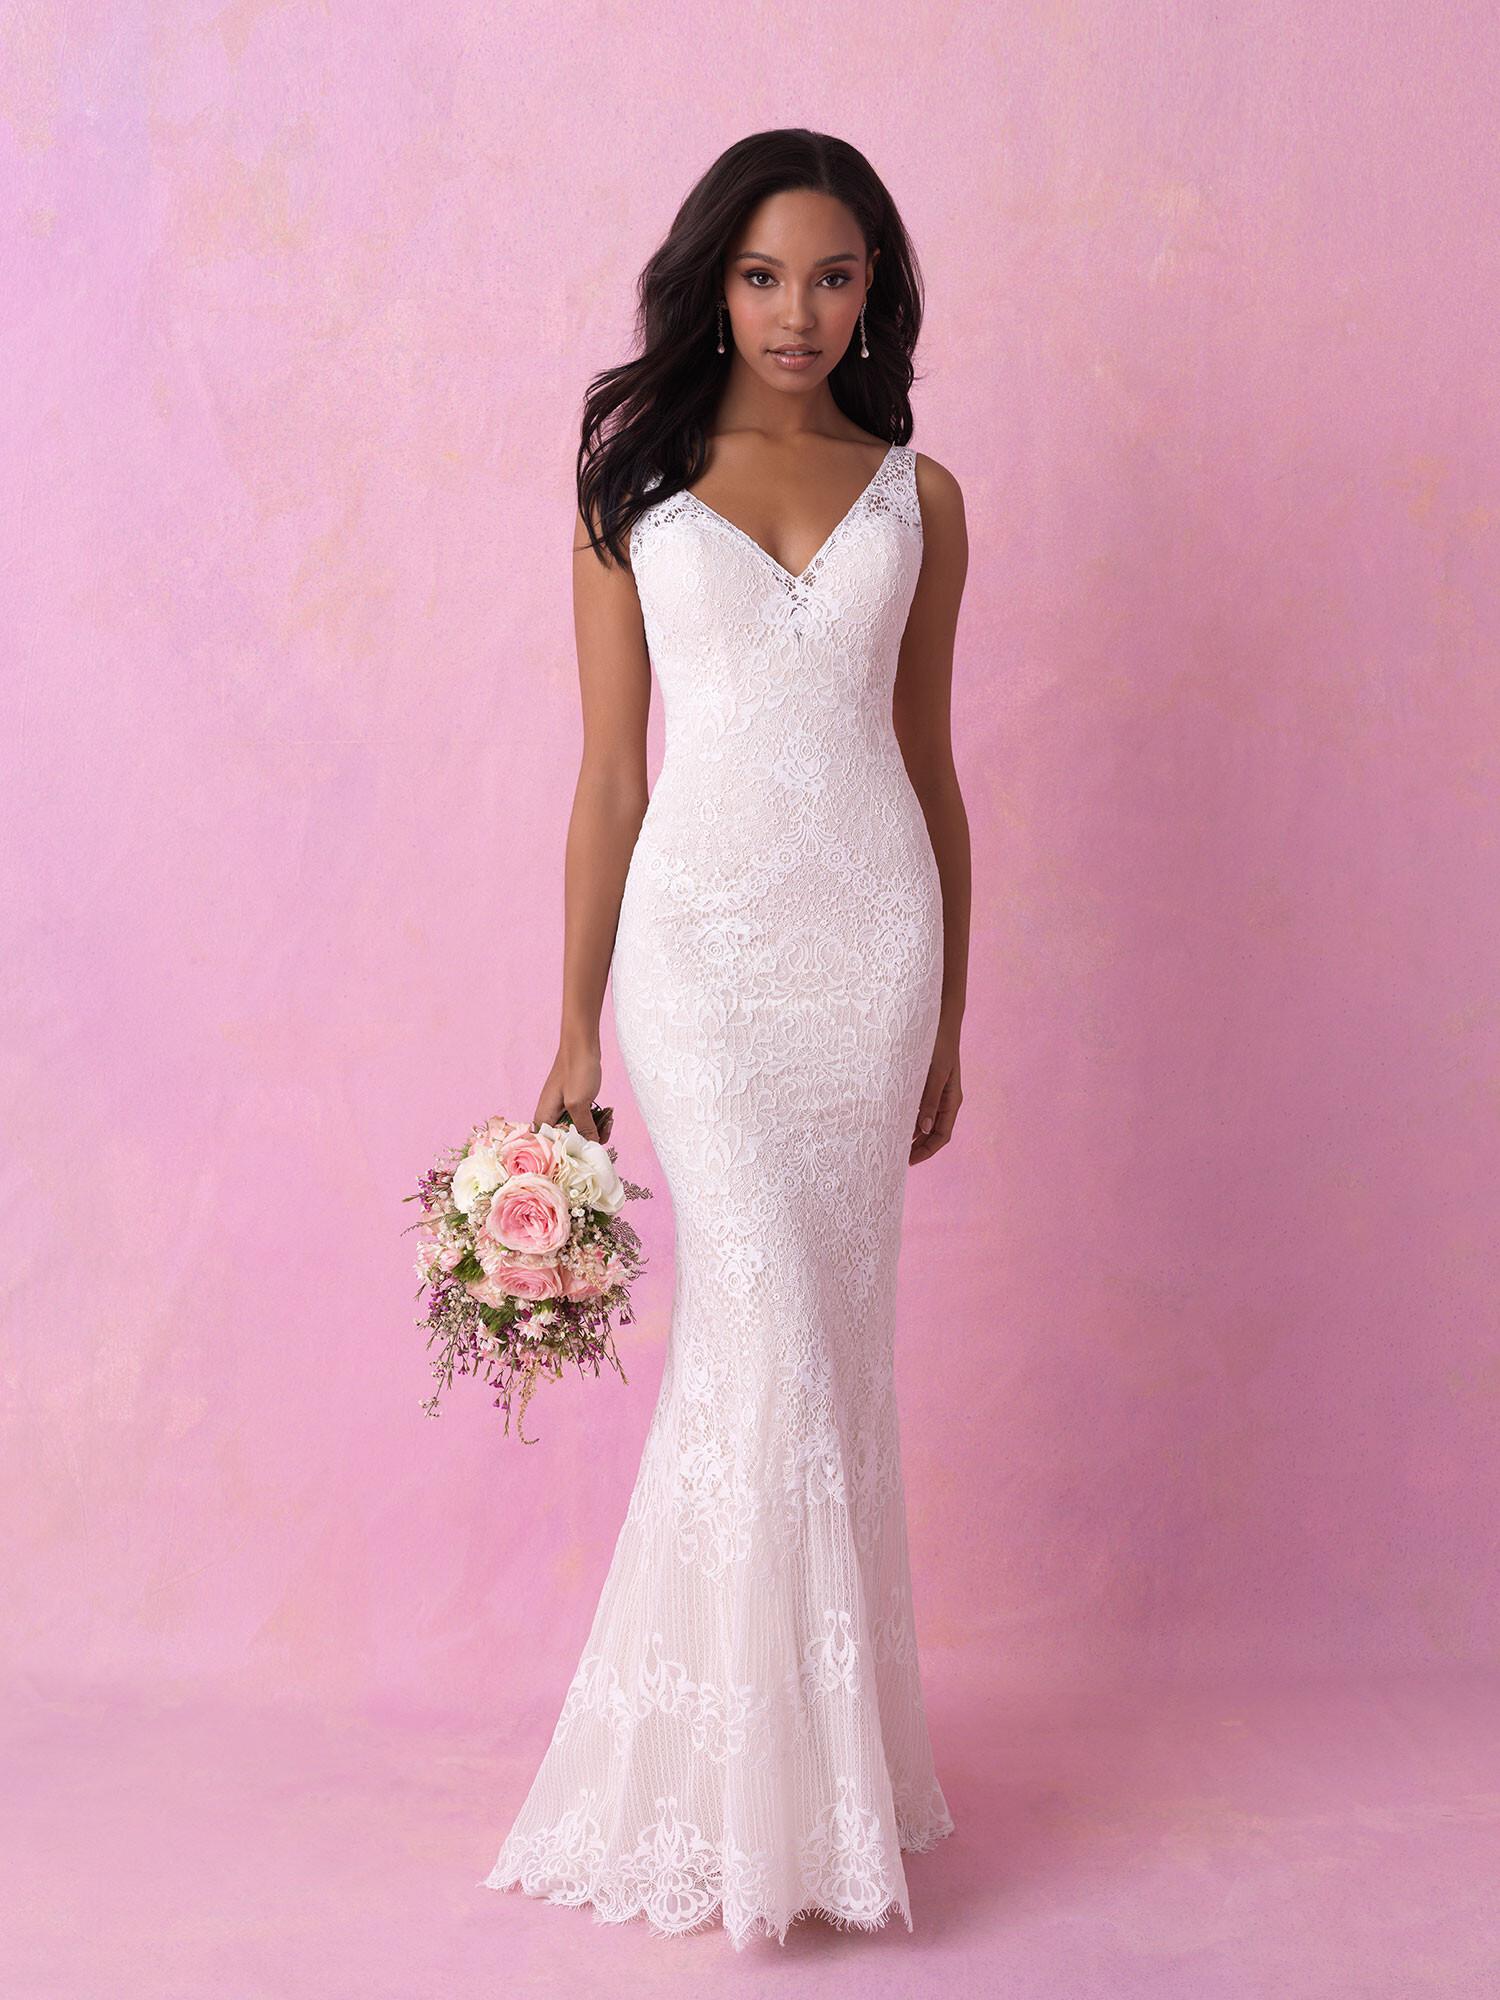 Vestidos de Novia de Allure Bridals - 2019 - Matrimonios.cl